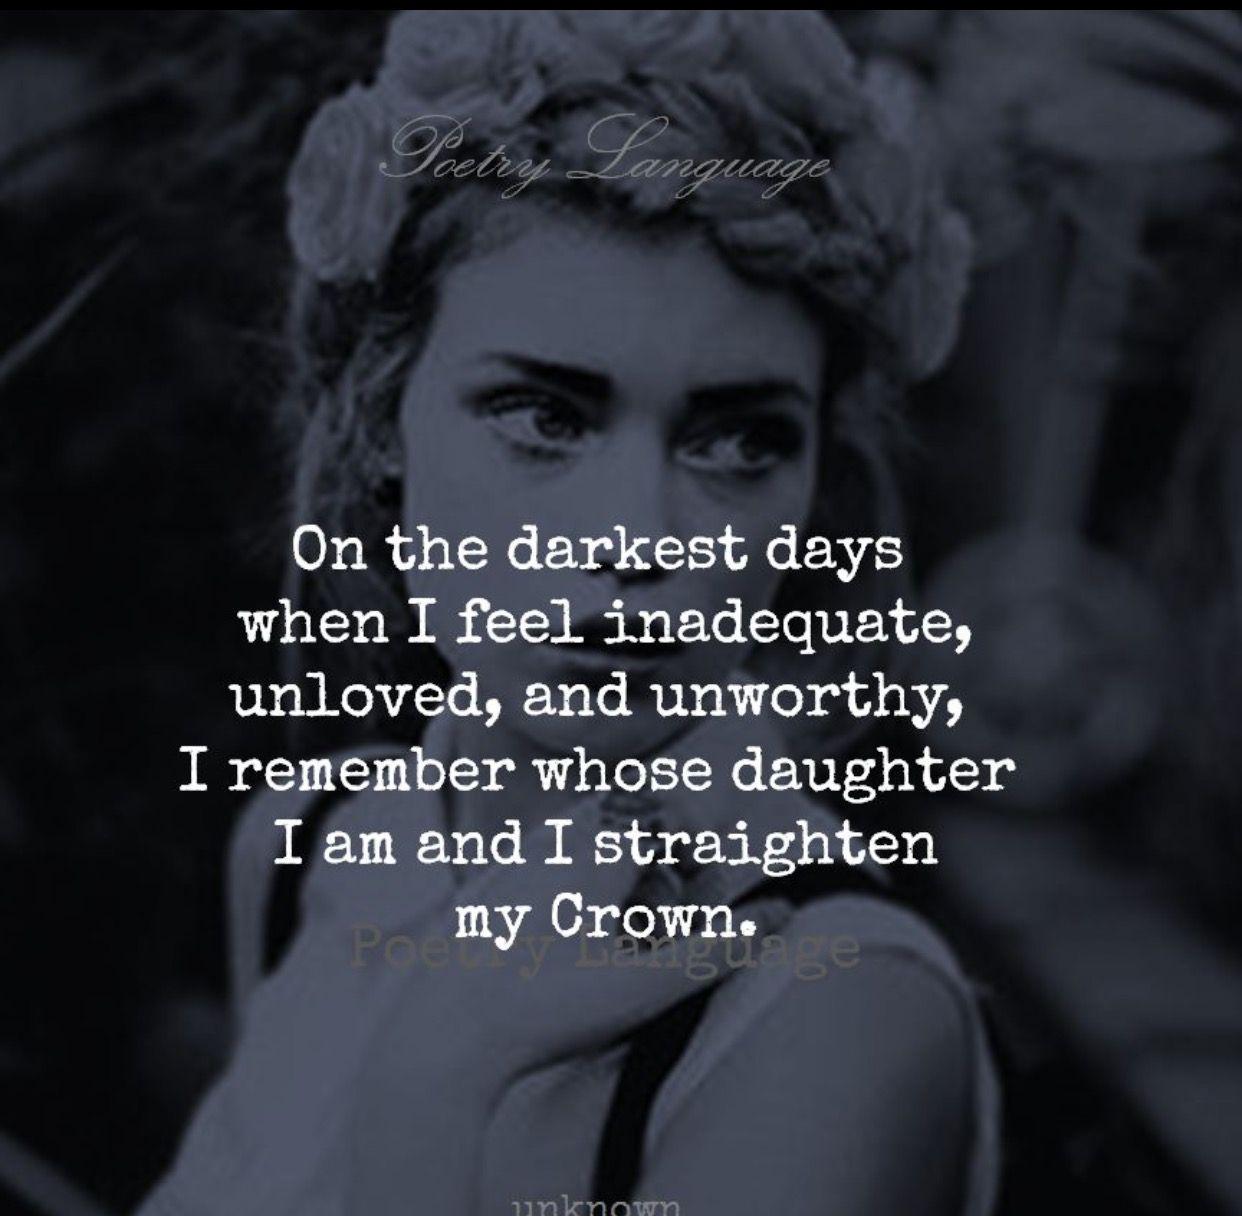 Soooooo freakin true!!! (With images) | Friendship quotes ...